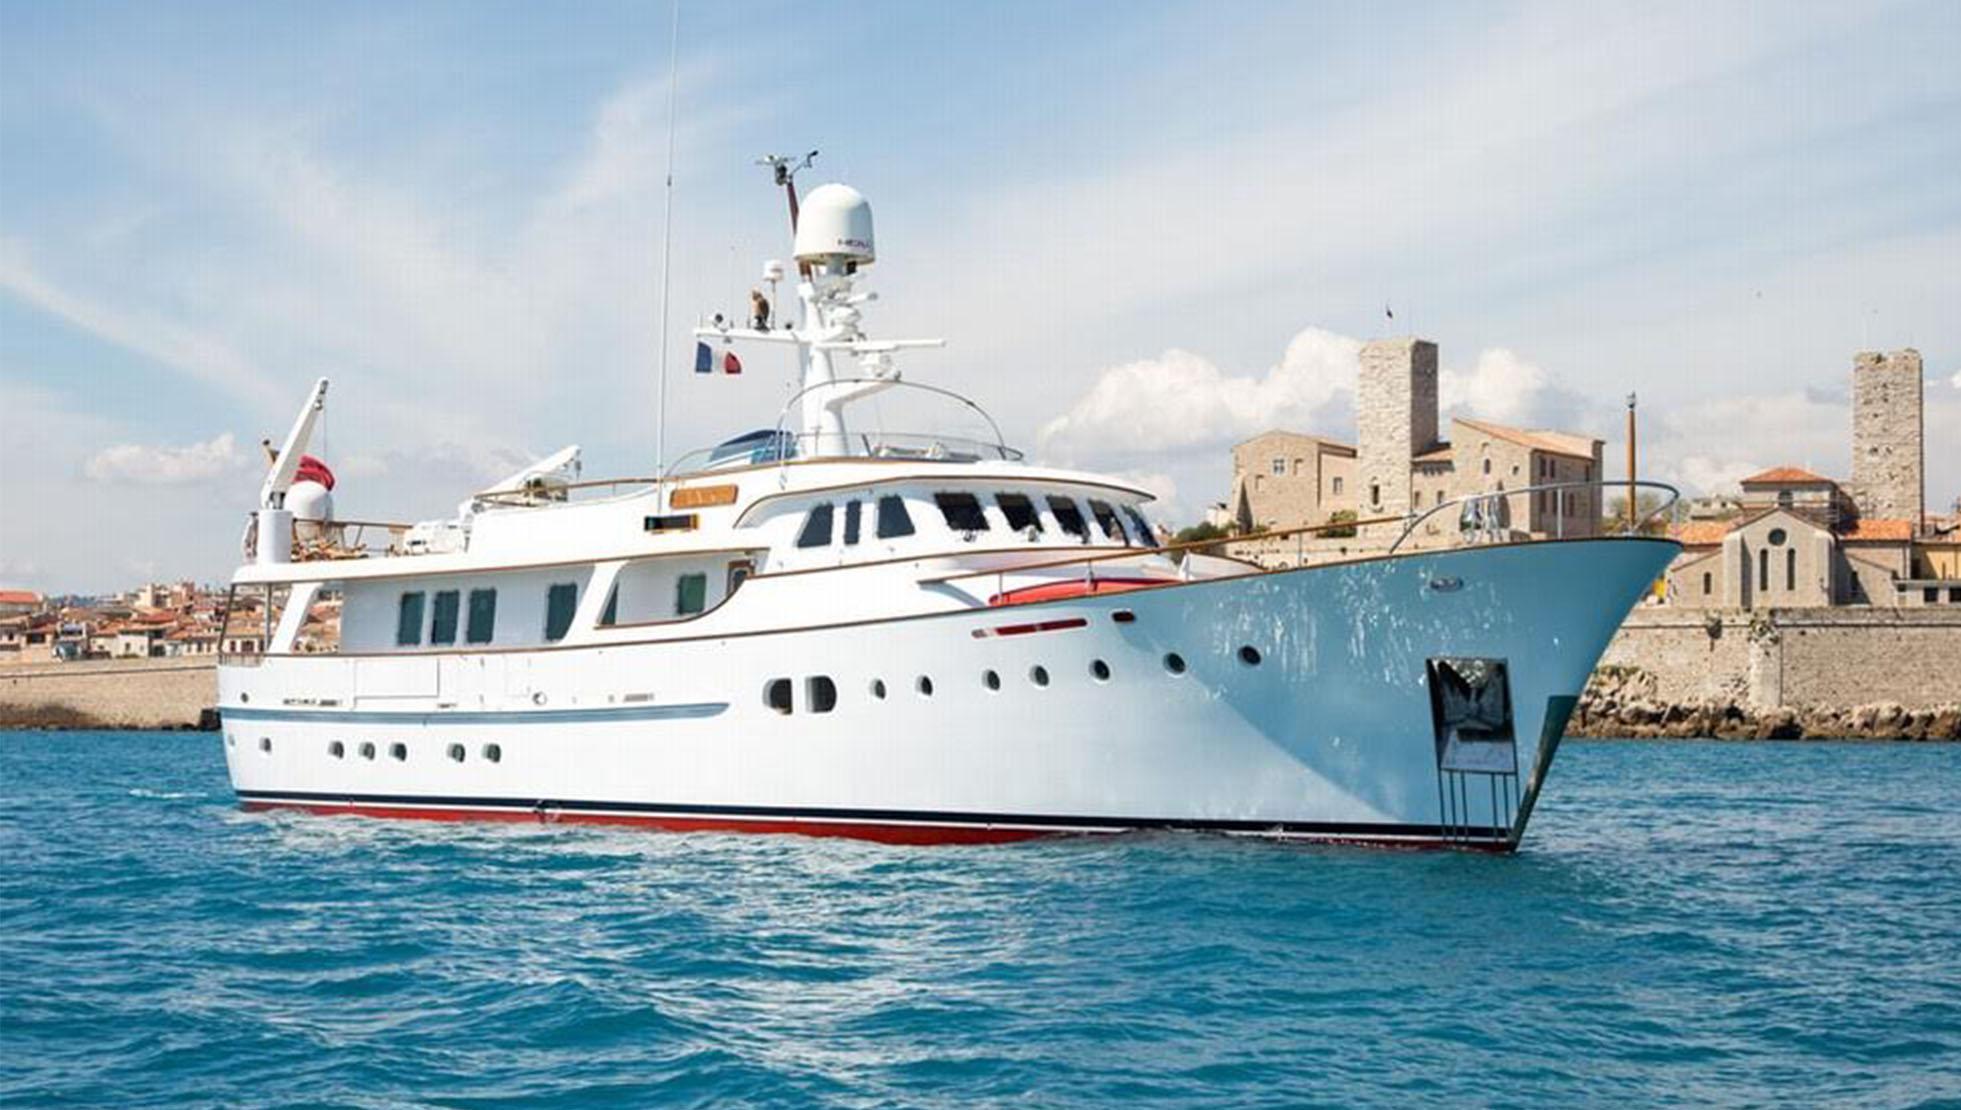 Evnike Yacht for sale 1